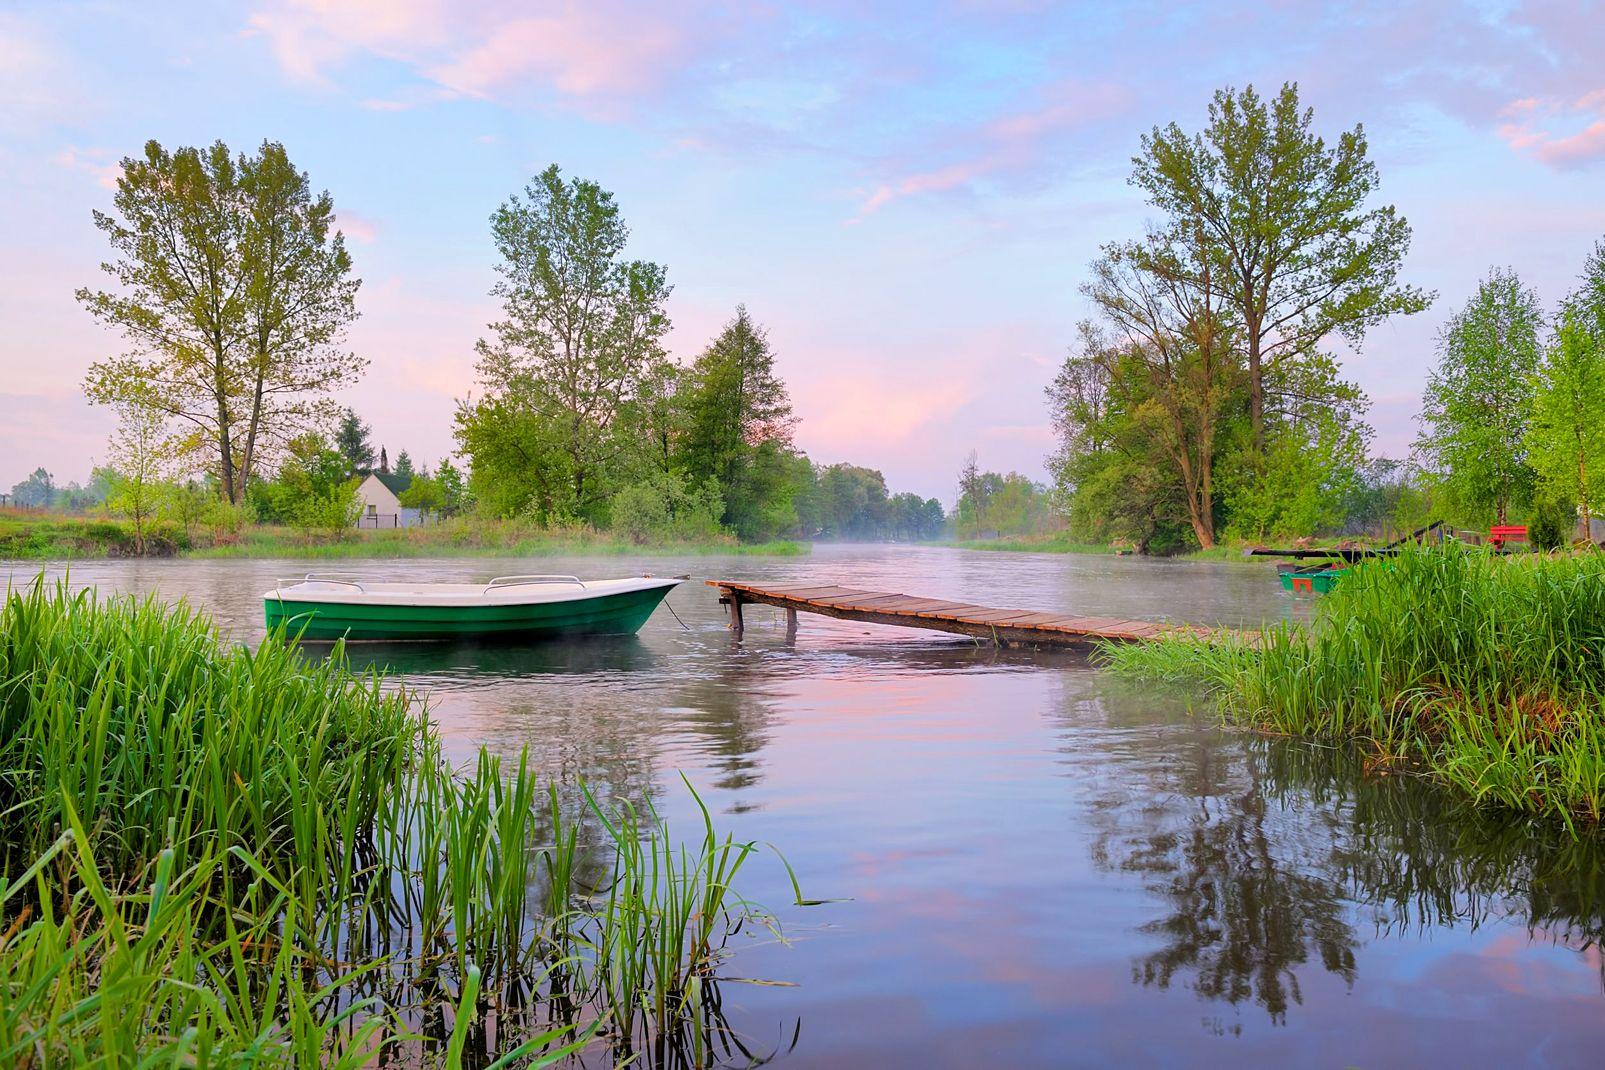 Visiter La Pologne Le Guide De Voyage Easyvoyage